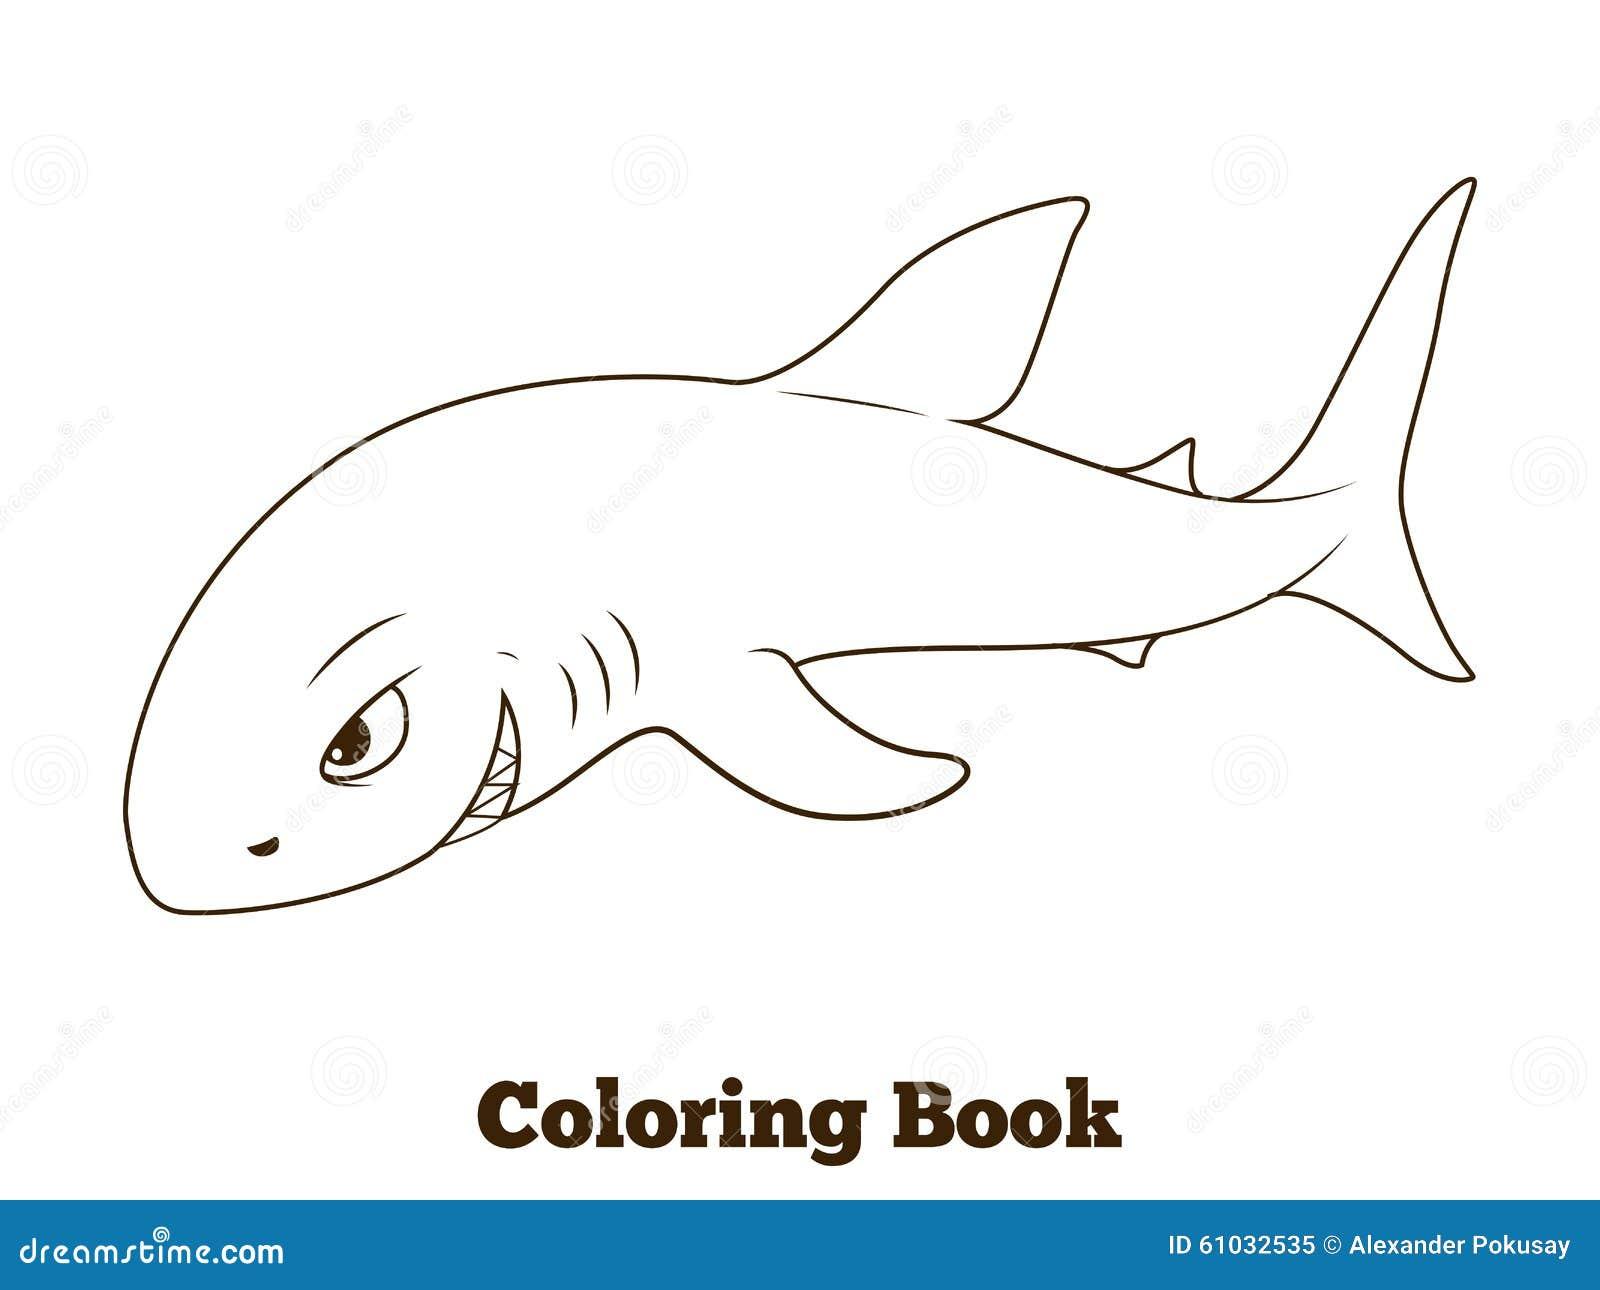 cartoon shark coloring pages - coloring book shark cartoon educational stock vector